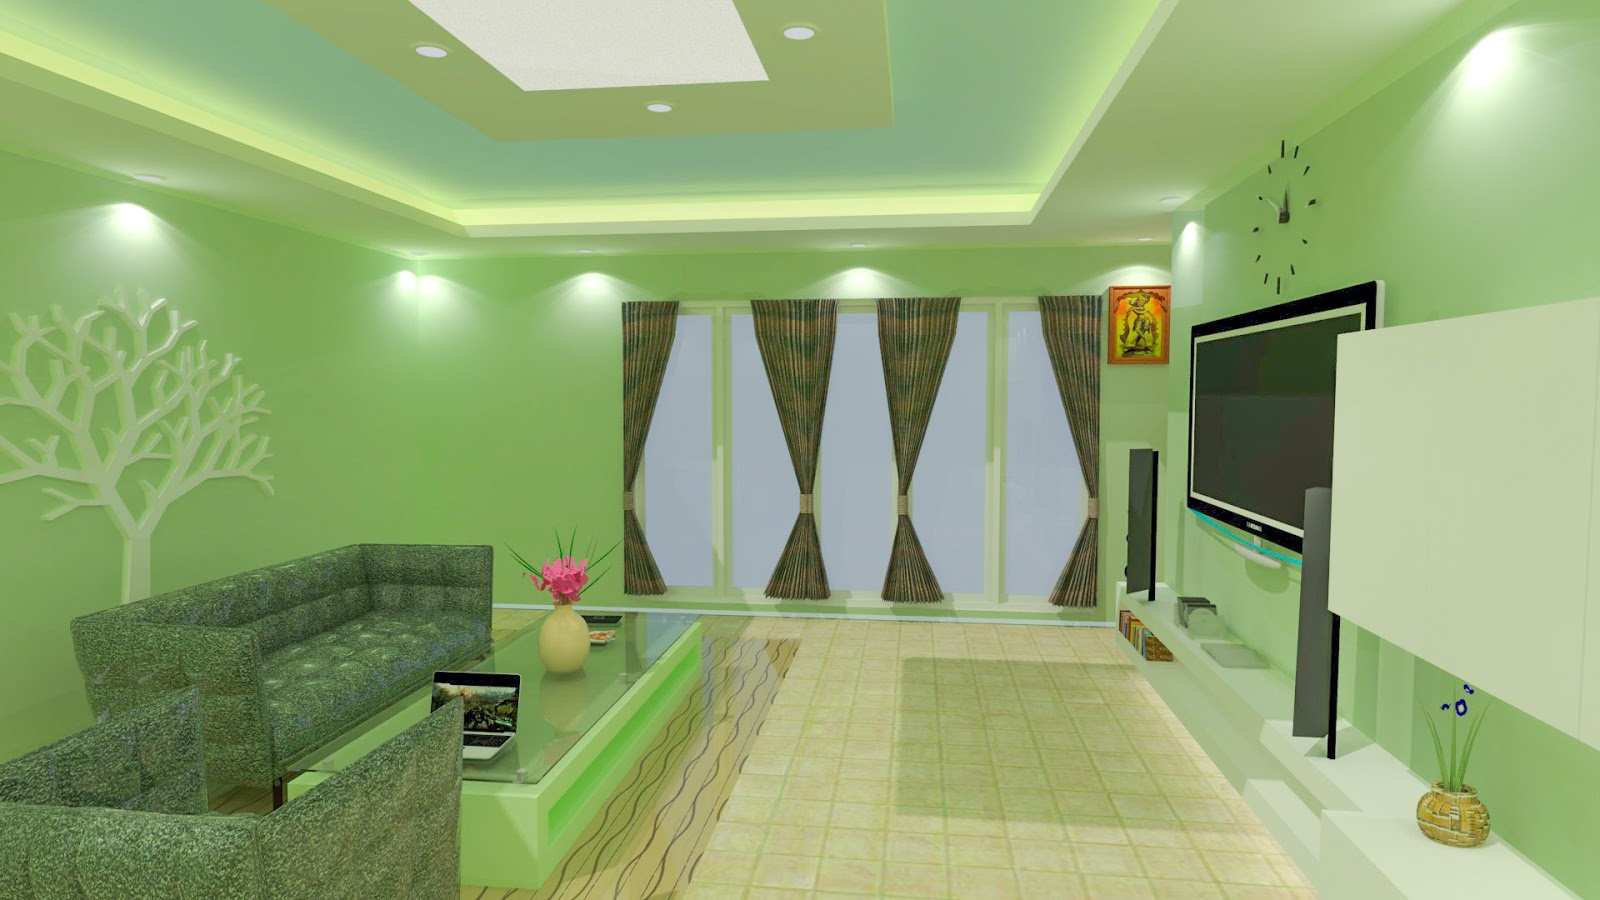 s3 designs9 simple living hall design rh s3designs9 blogspot com